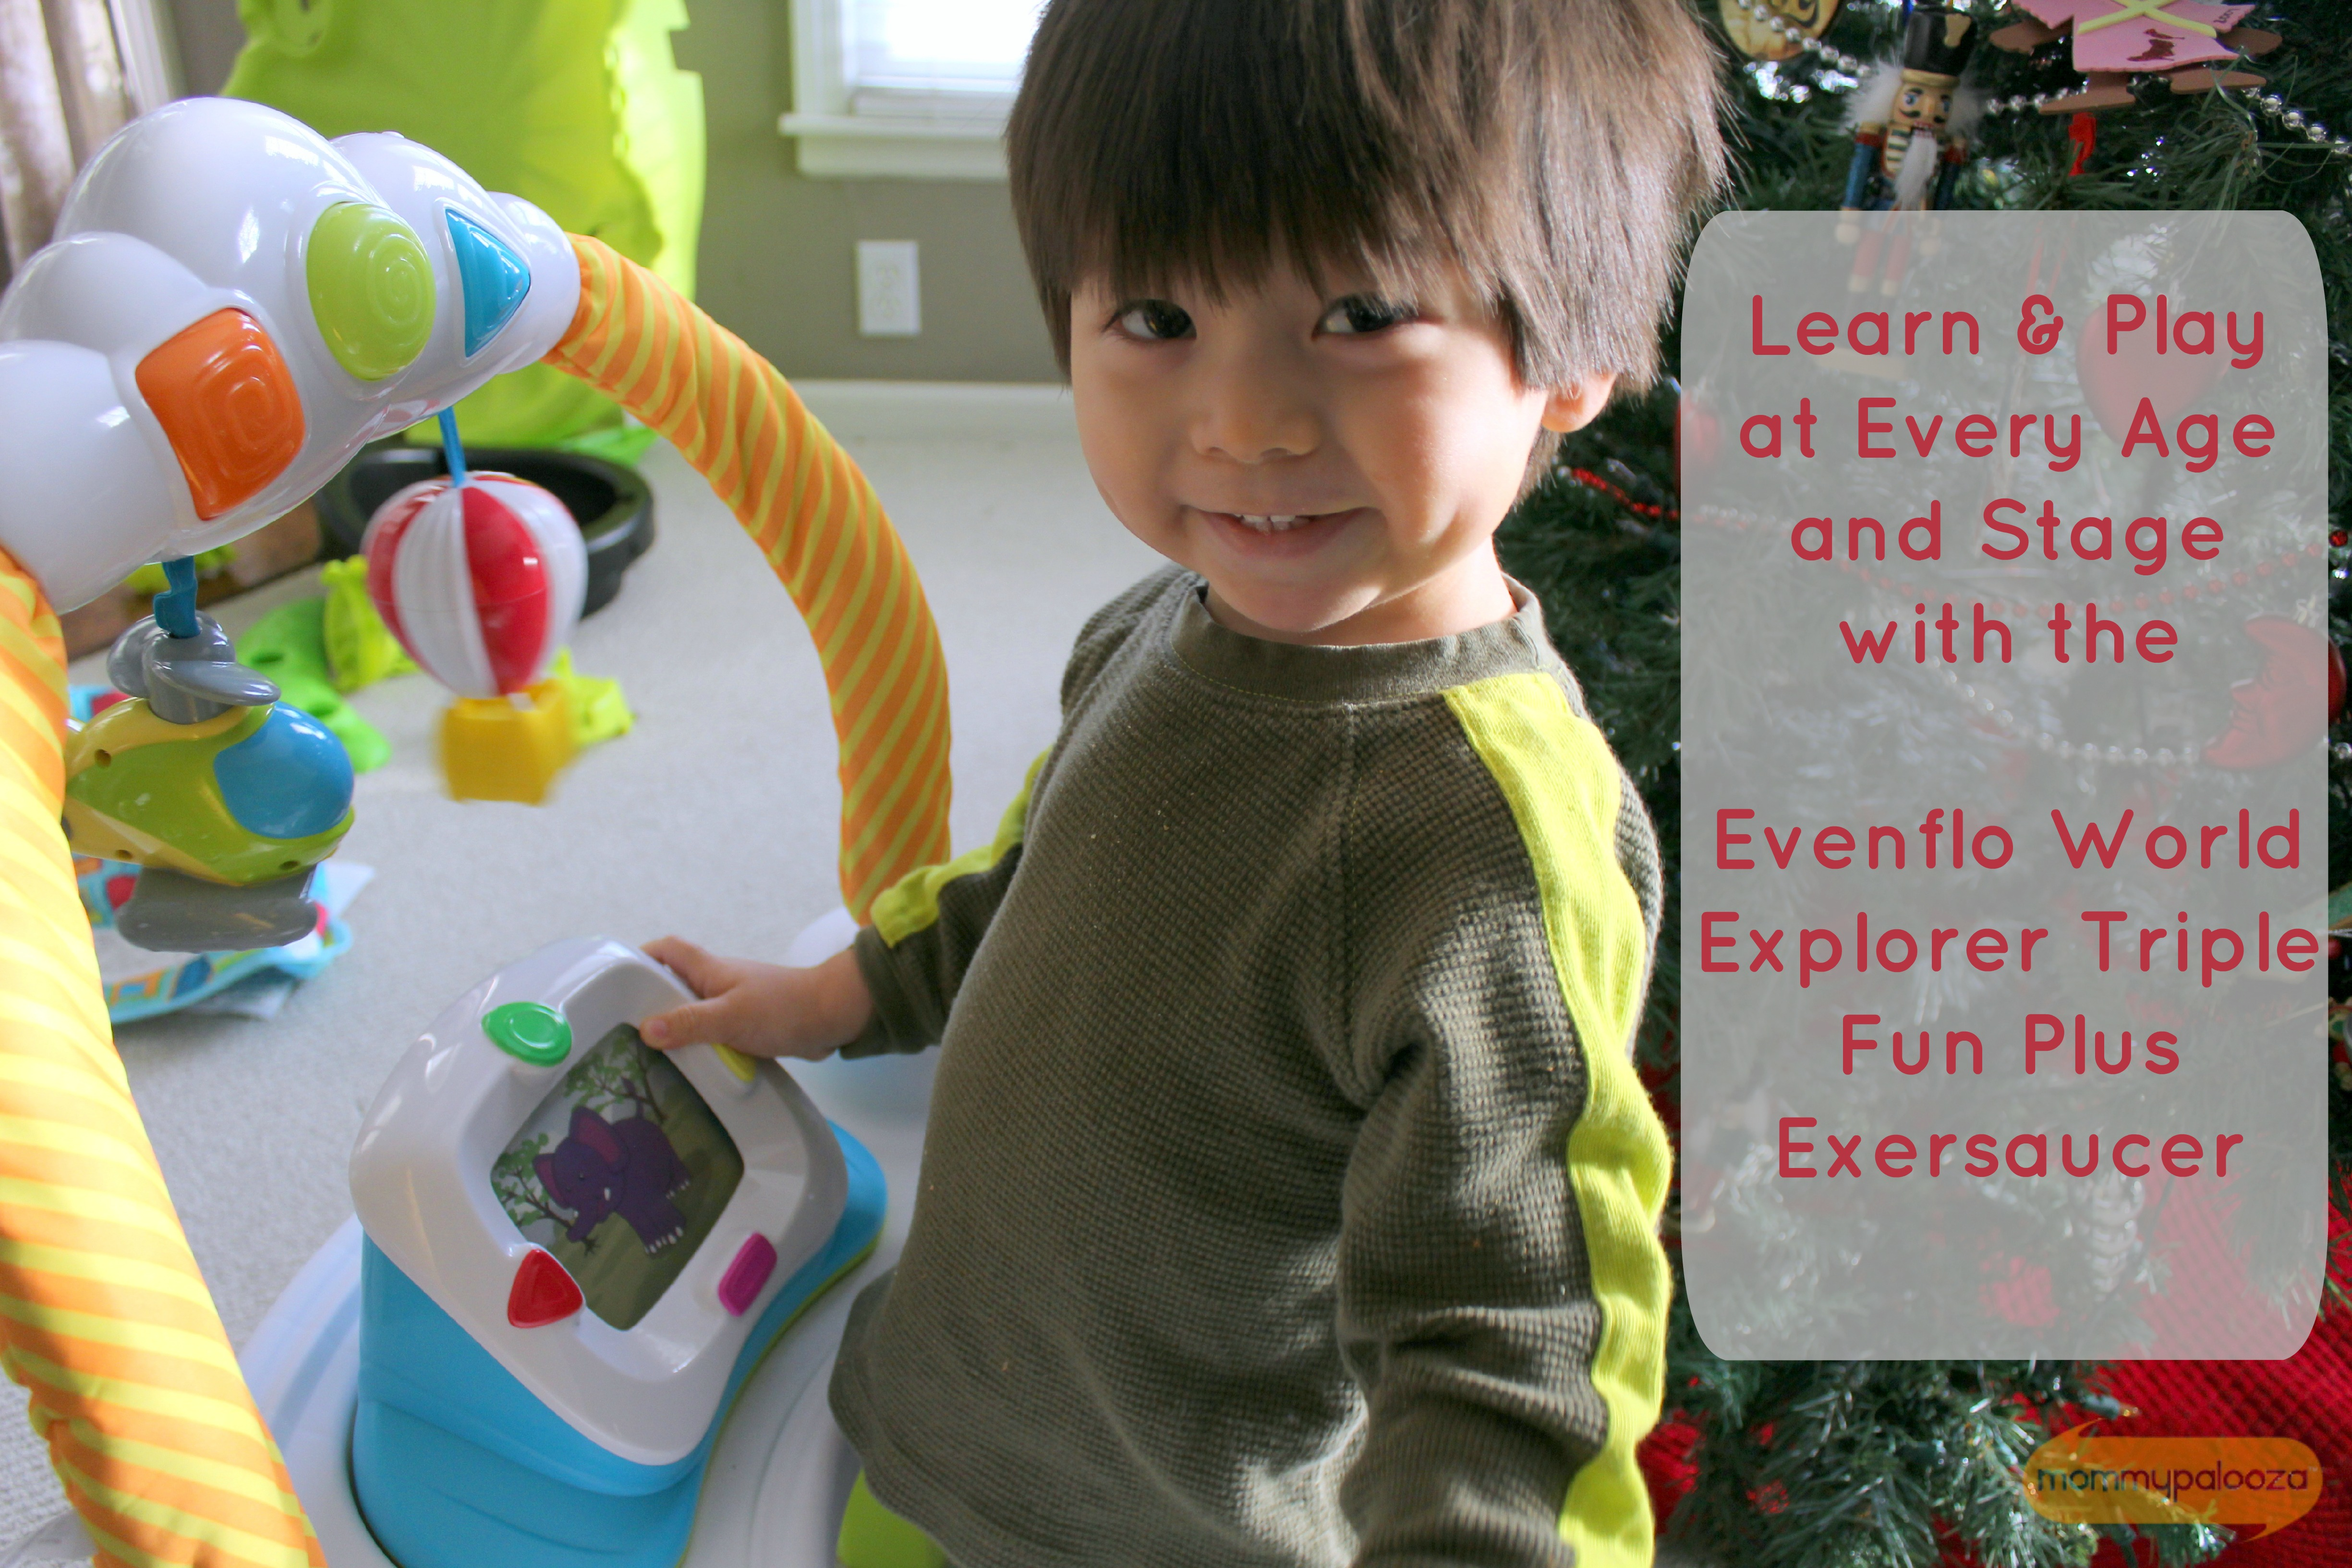 Evenflo World Explorer Triple Fun Plus ExerSaucer #ExerSaucerExplorer